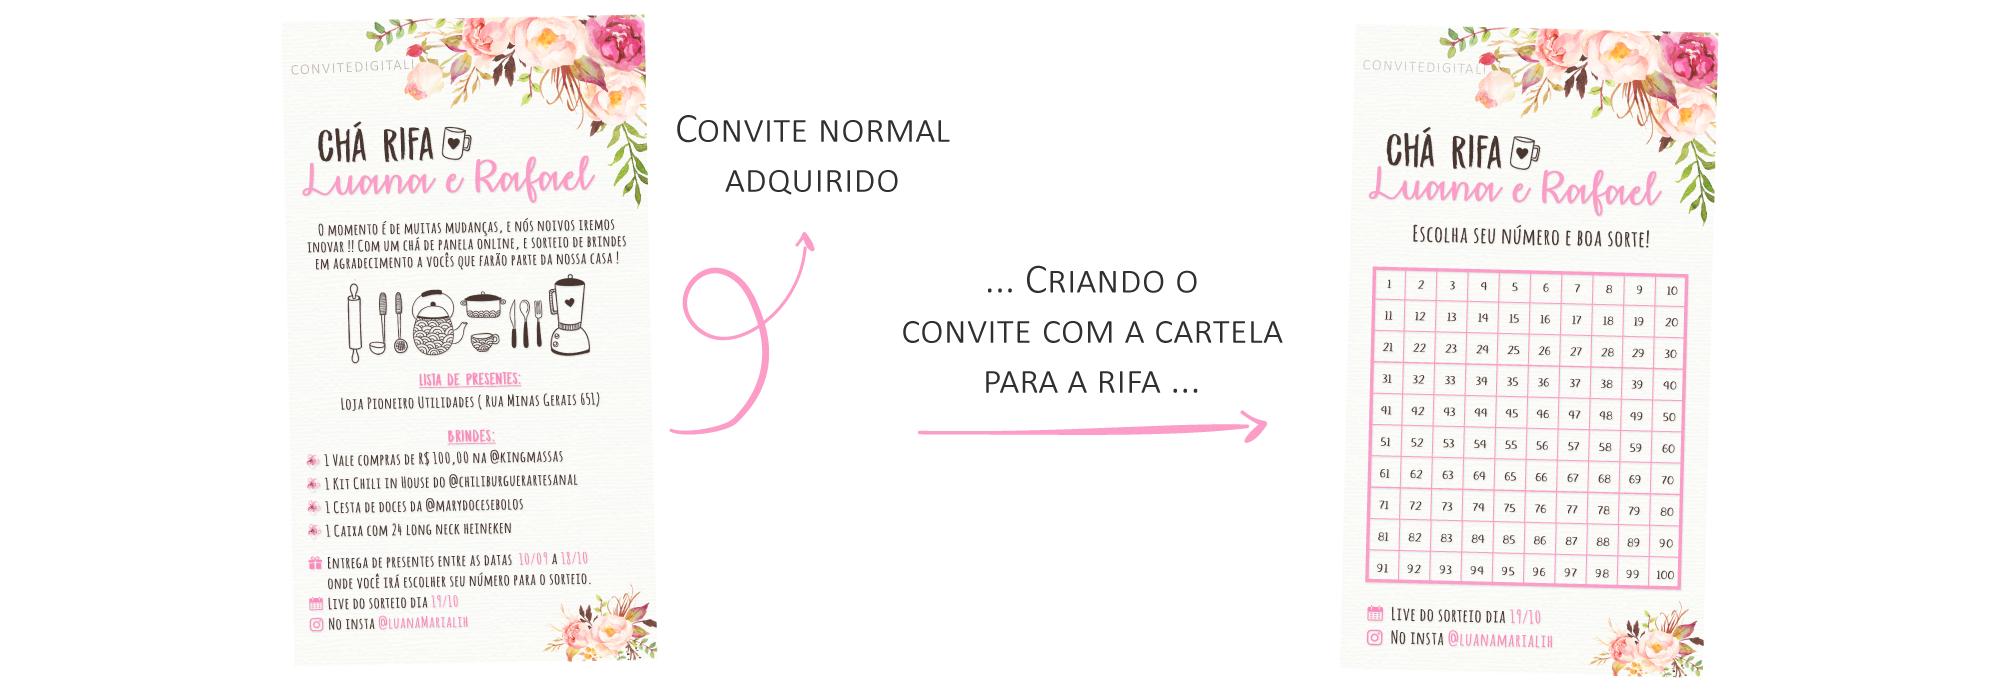 convite-digital-cartela-bindo-cha-rifa